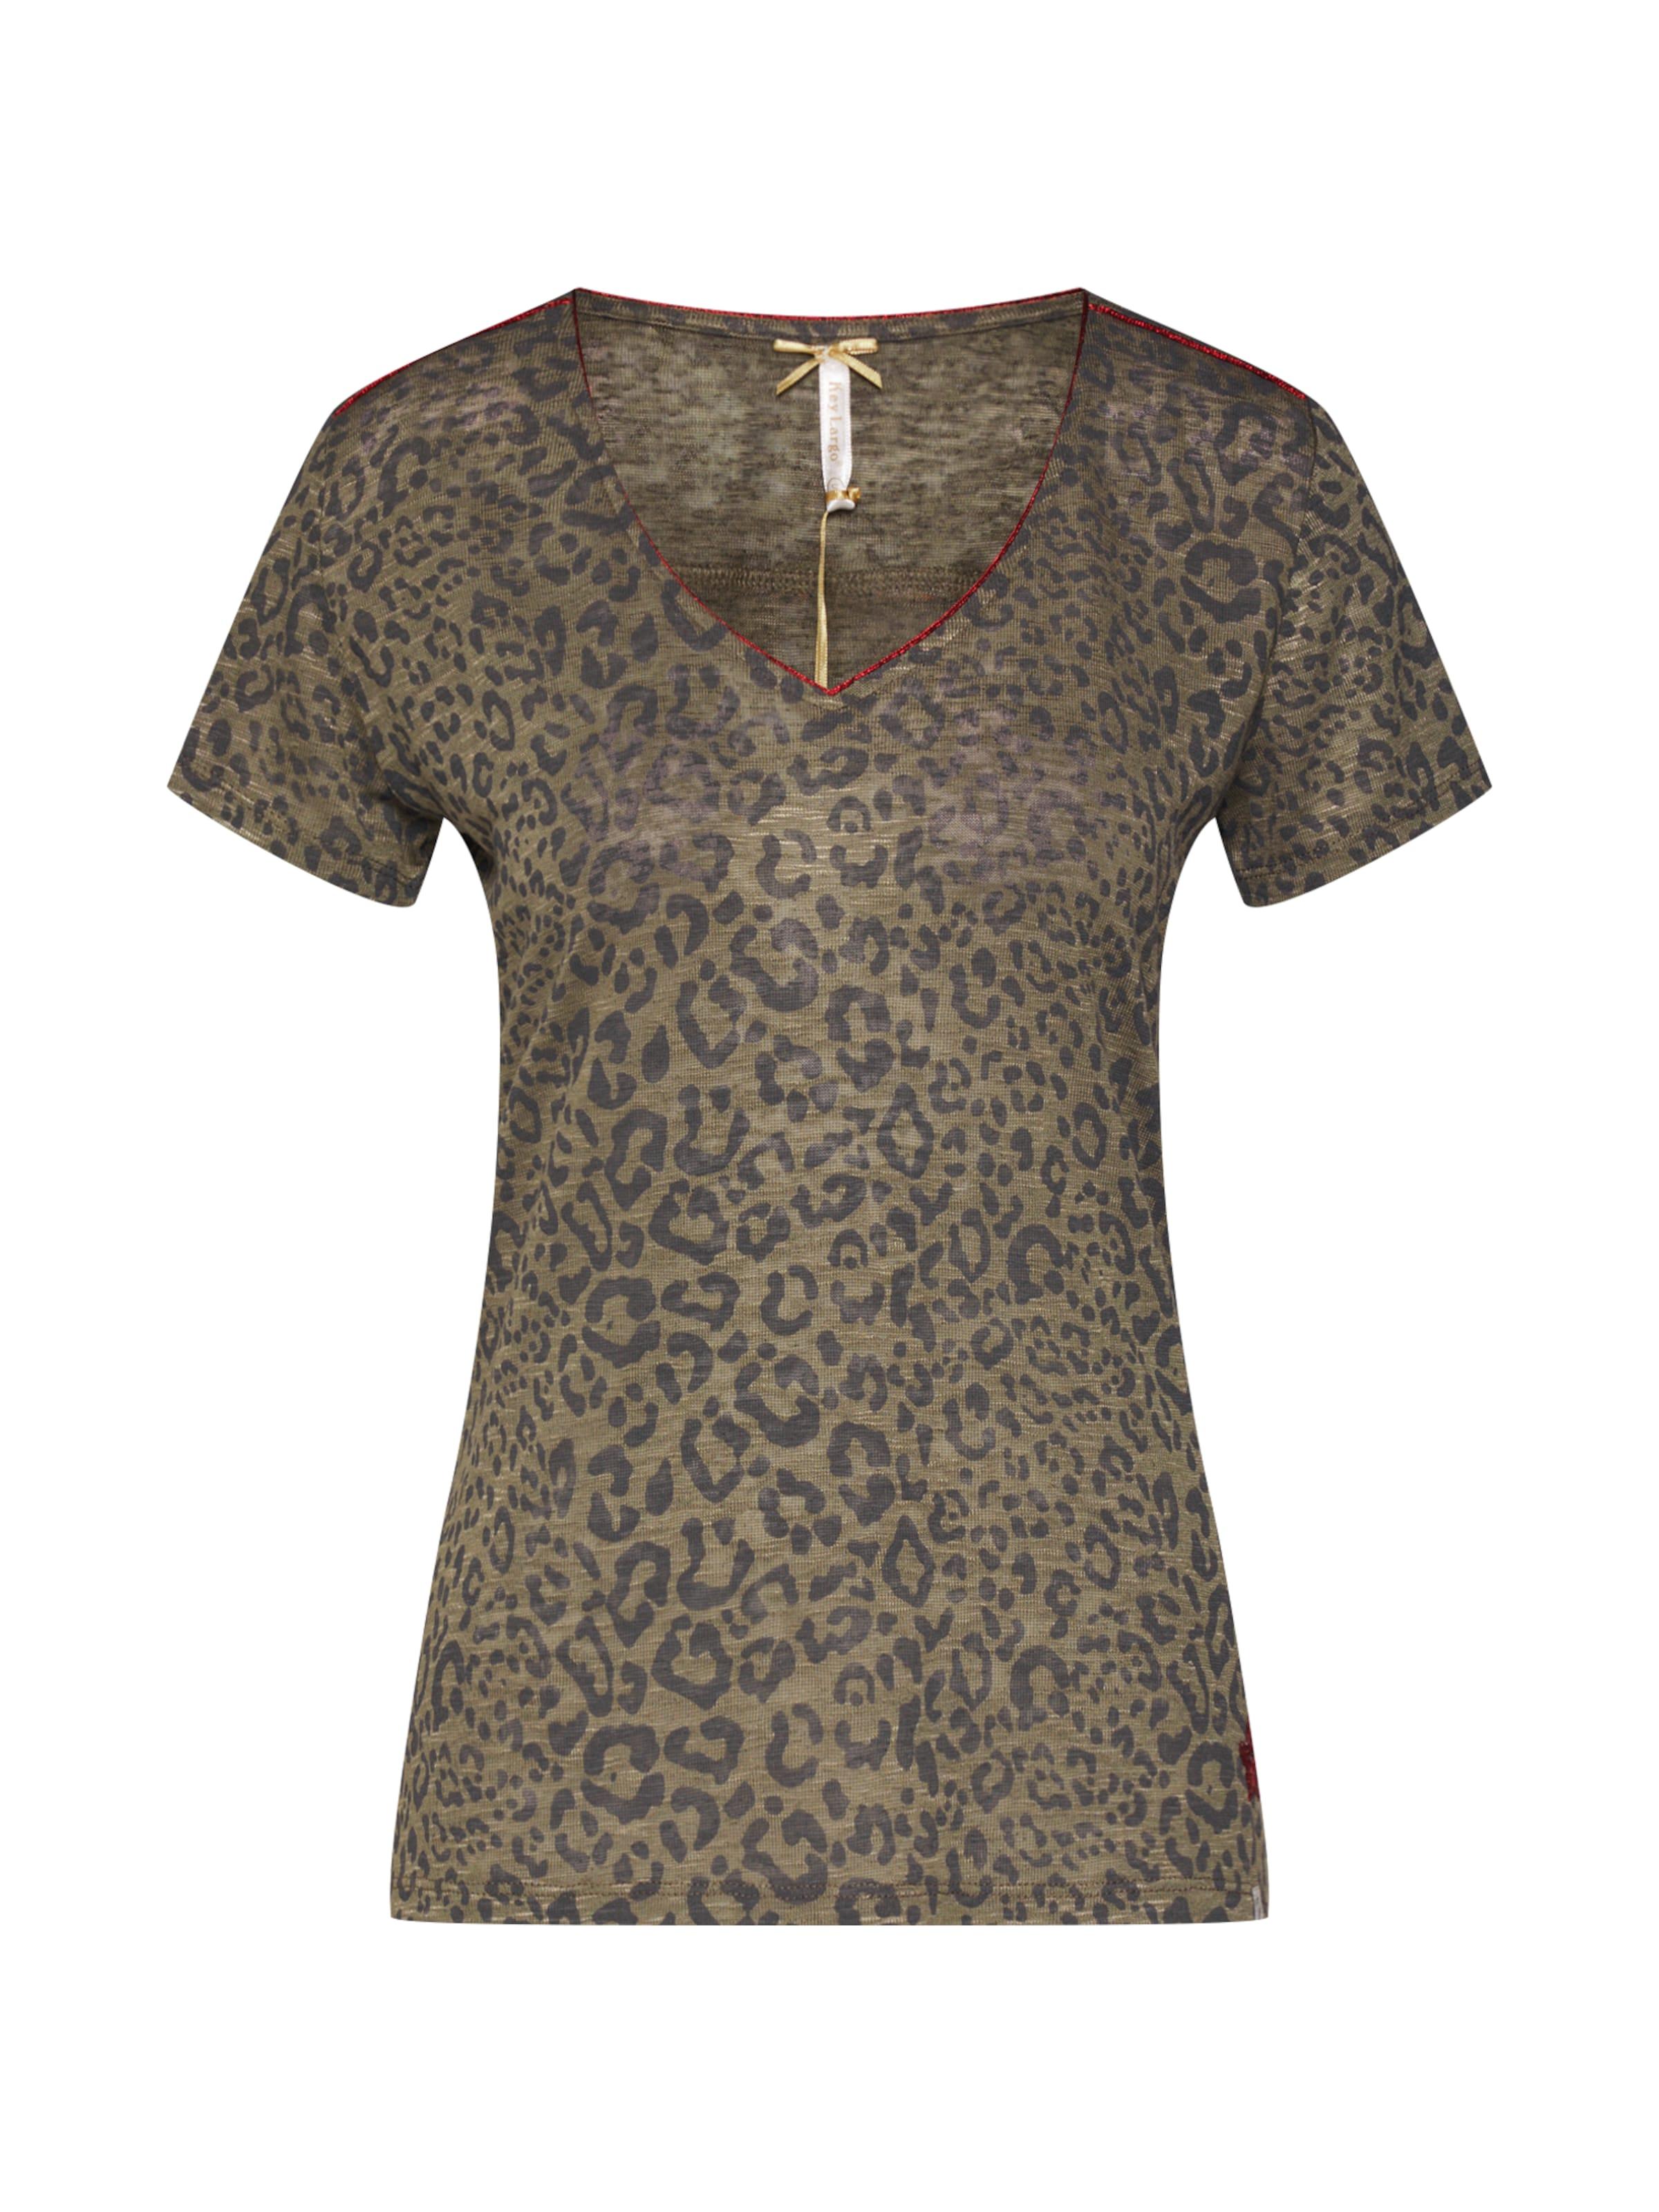 True' Largo 'wt In shirt Khaki T Key ZPTXiuOk